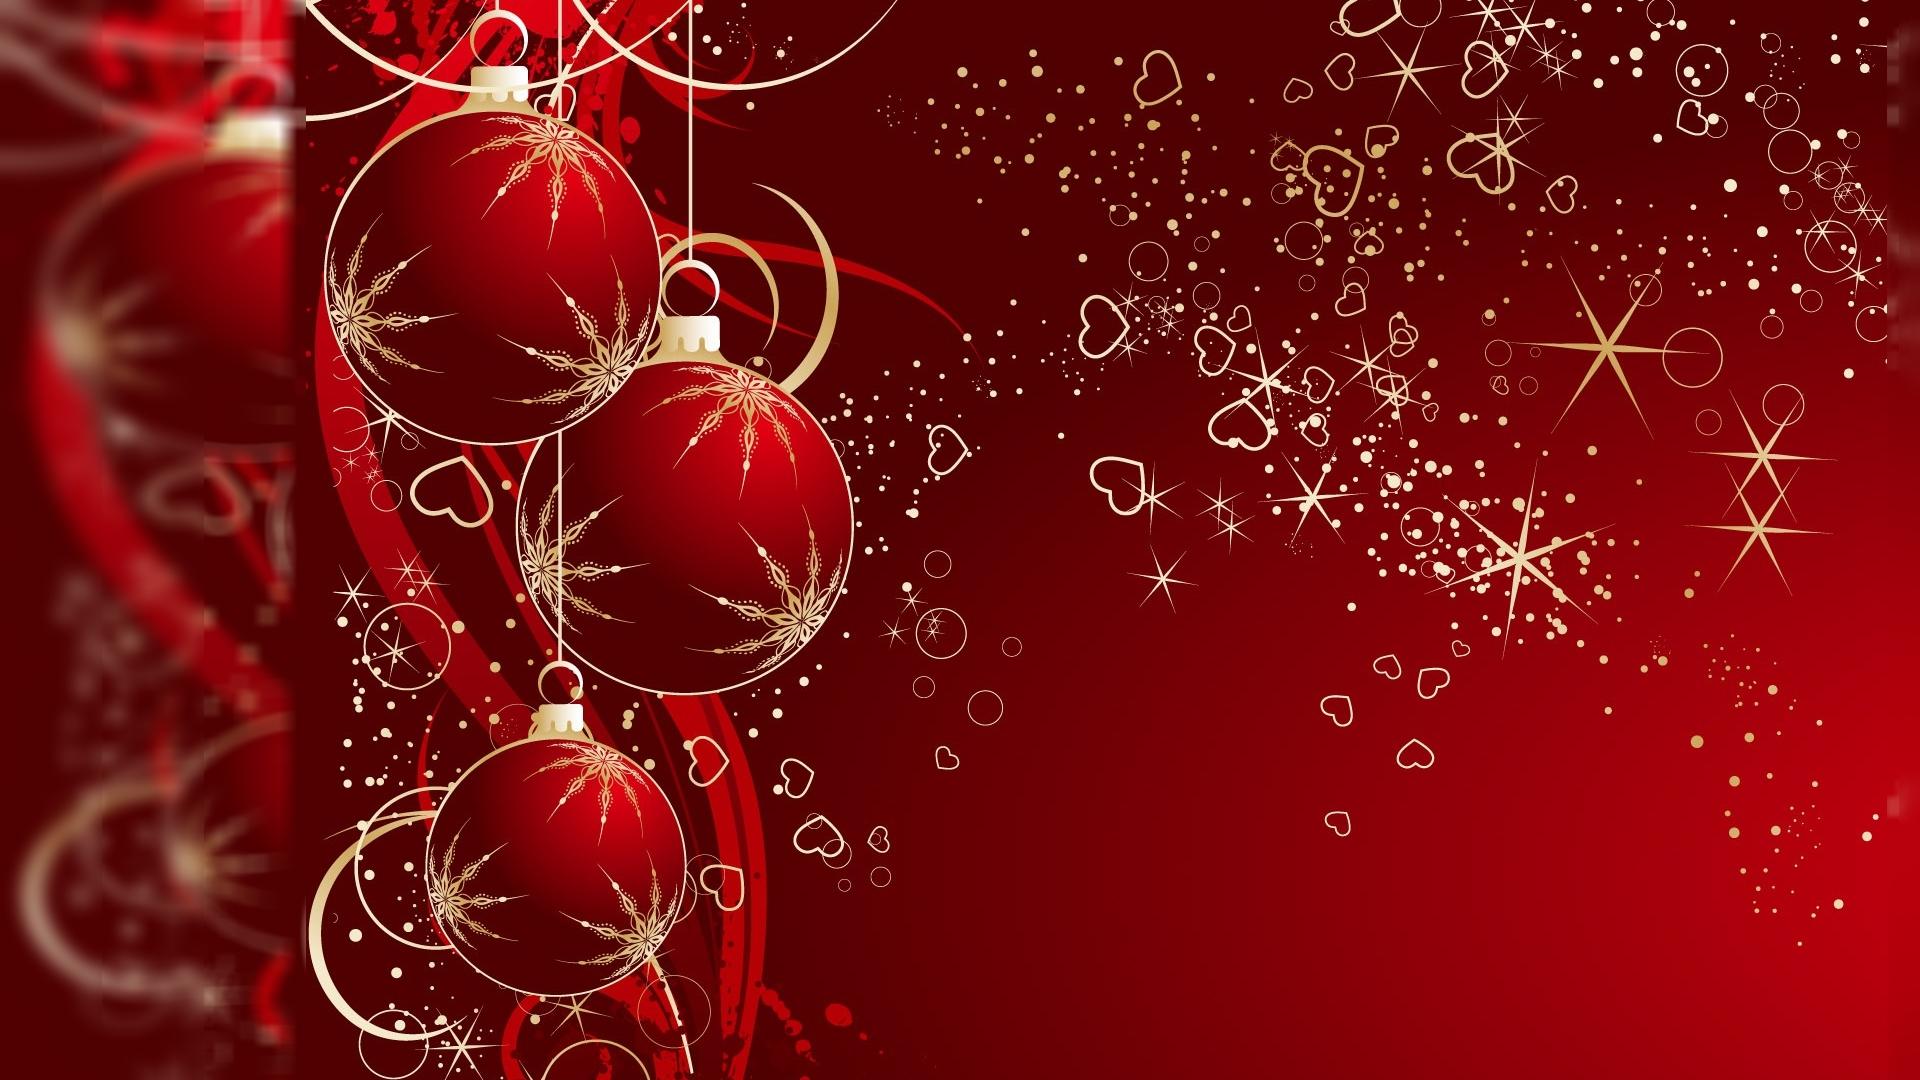 Christmas Wallpaper Hd wallpaper   736525 1920x1080